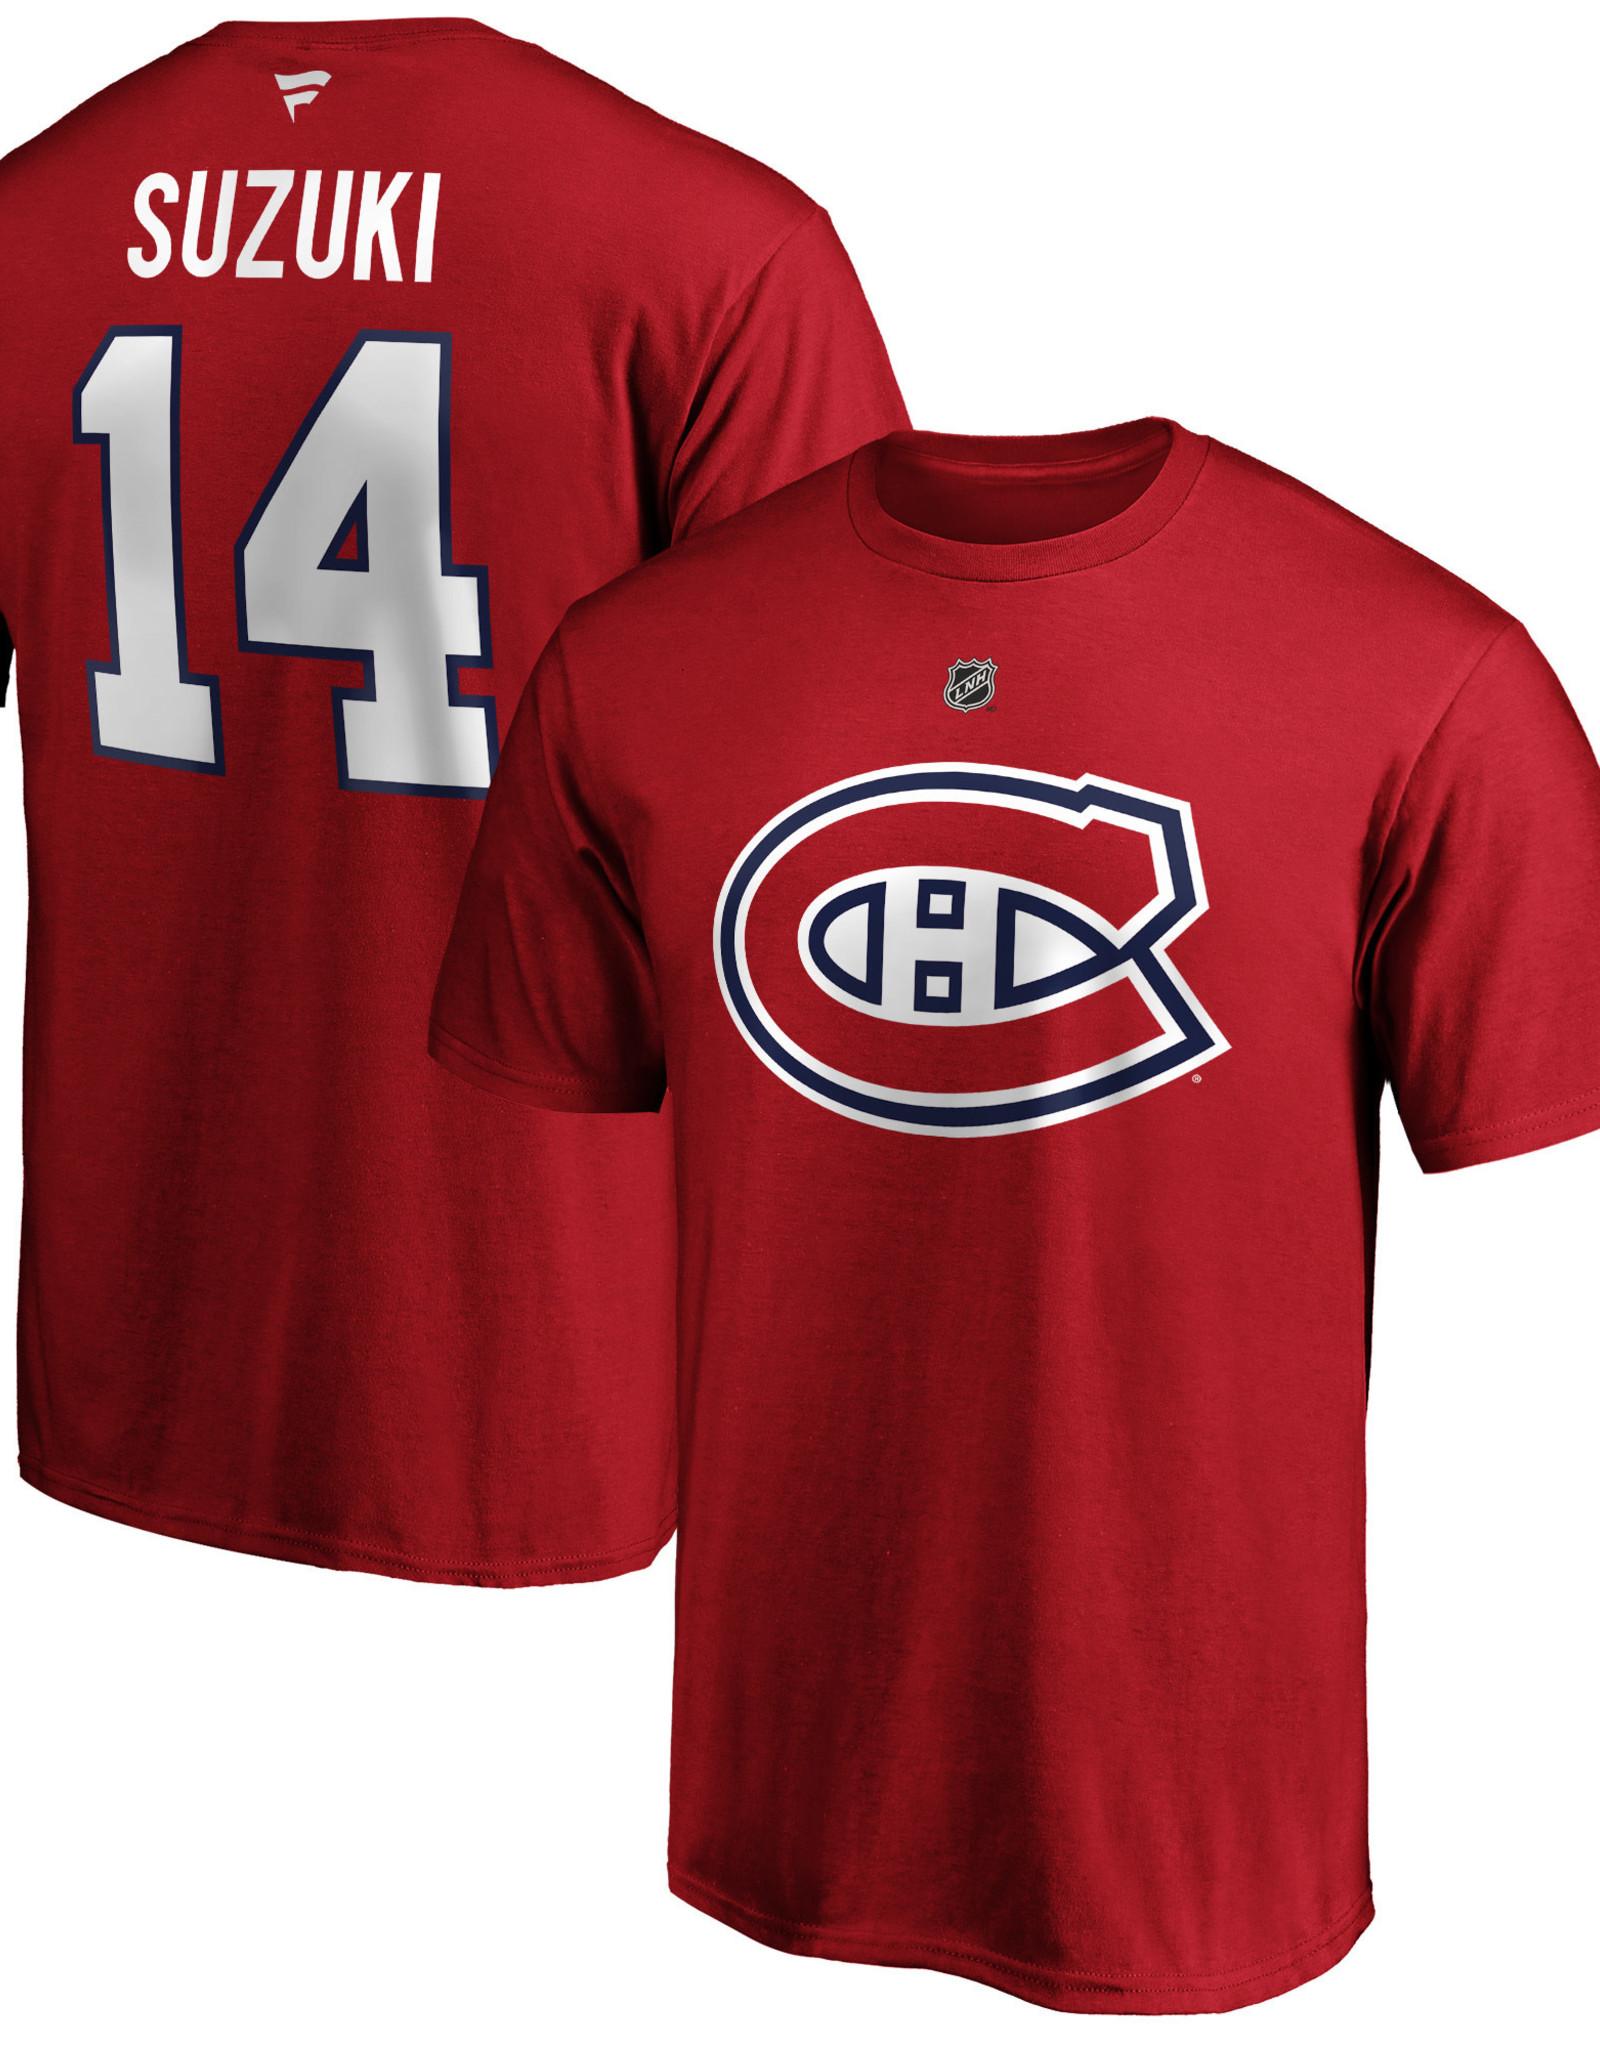 T-shirt Suziki Rouge SR (L)